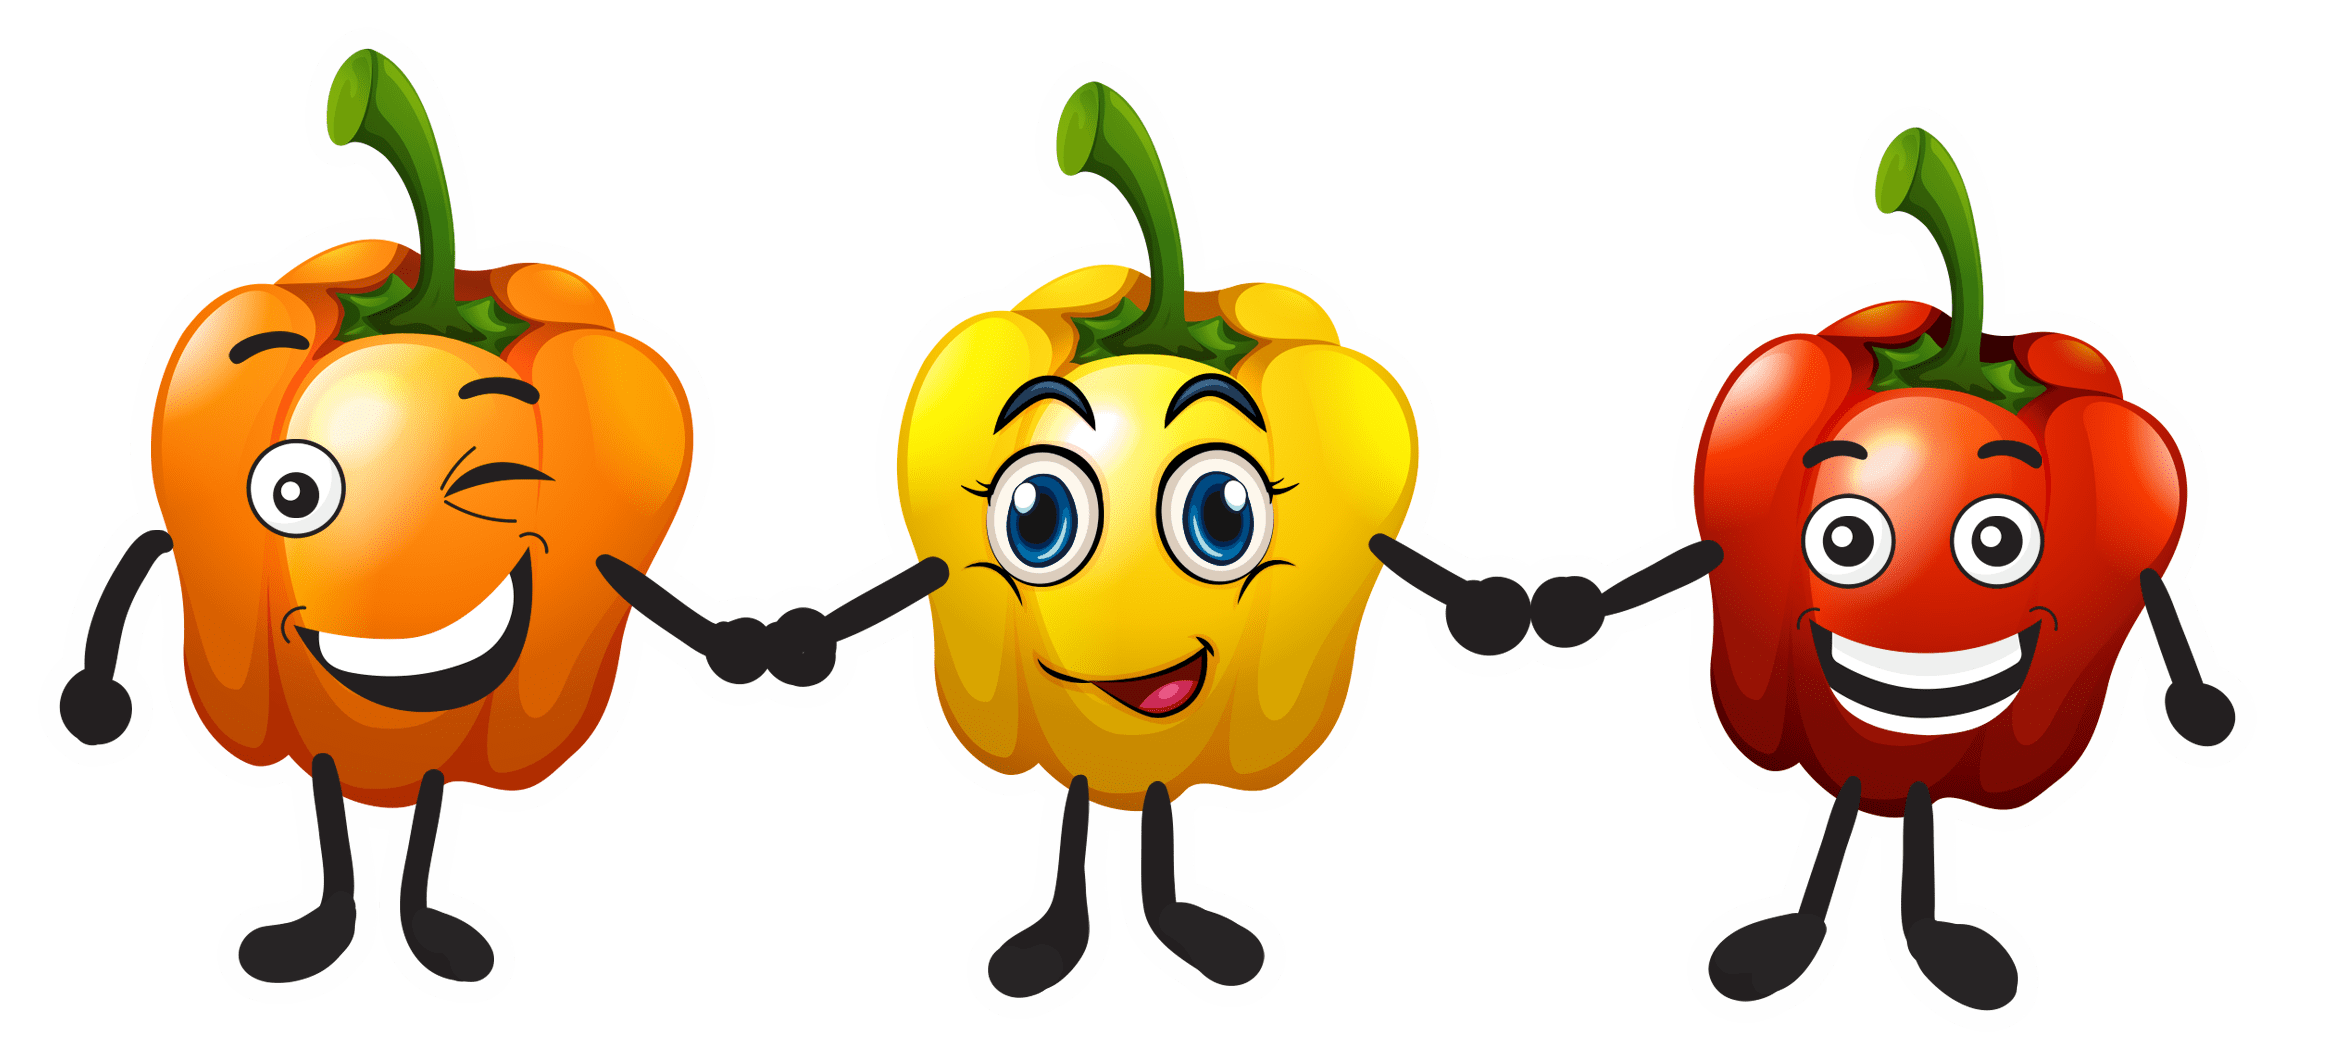 FruityCons messages sticker-5